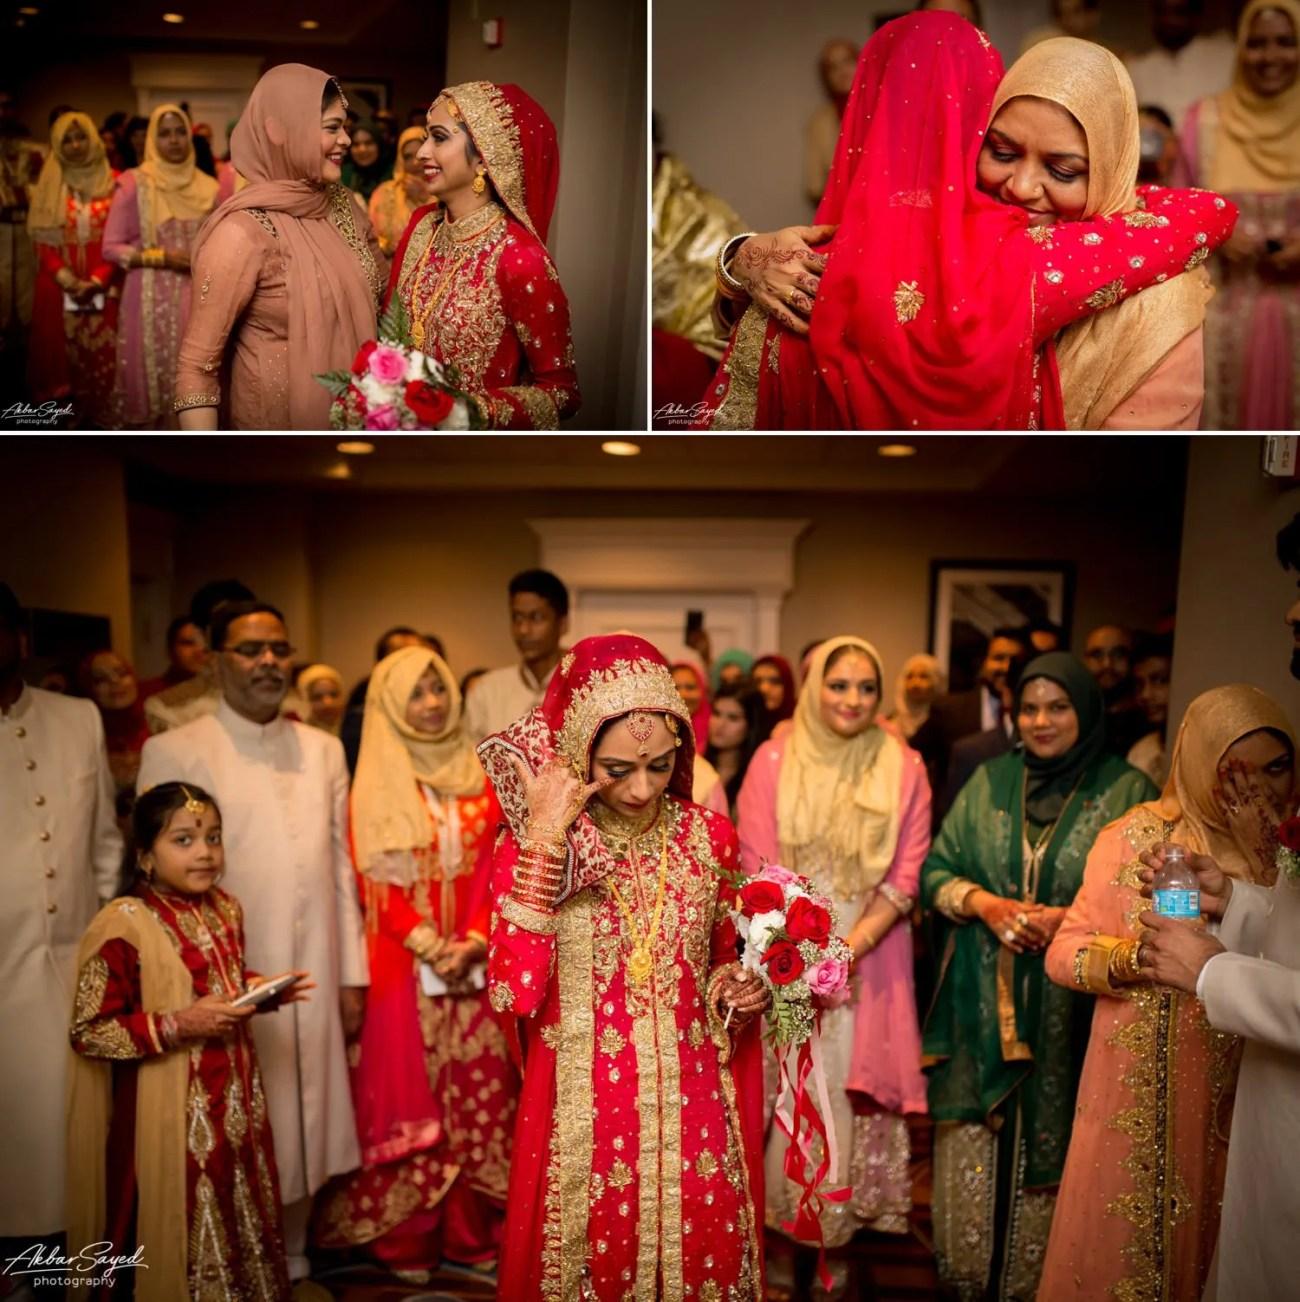 Ishrath and Imran - Silver Spring, Maryland Pakistani Wedding 10